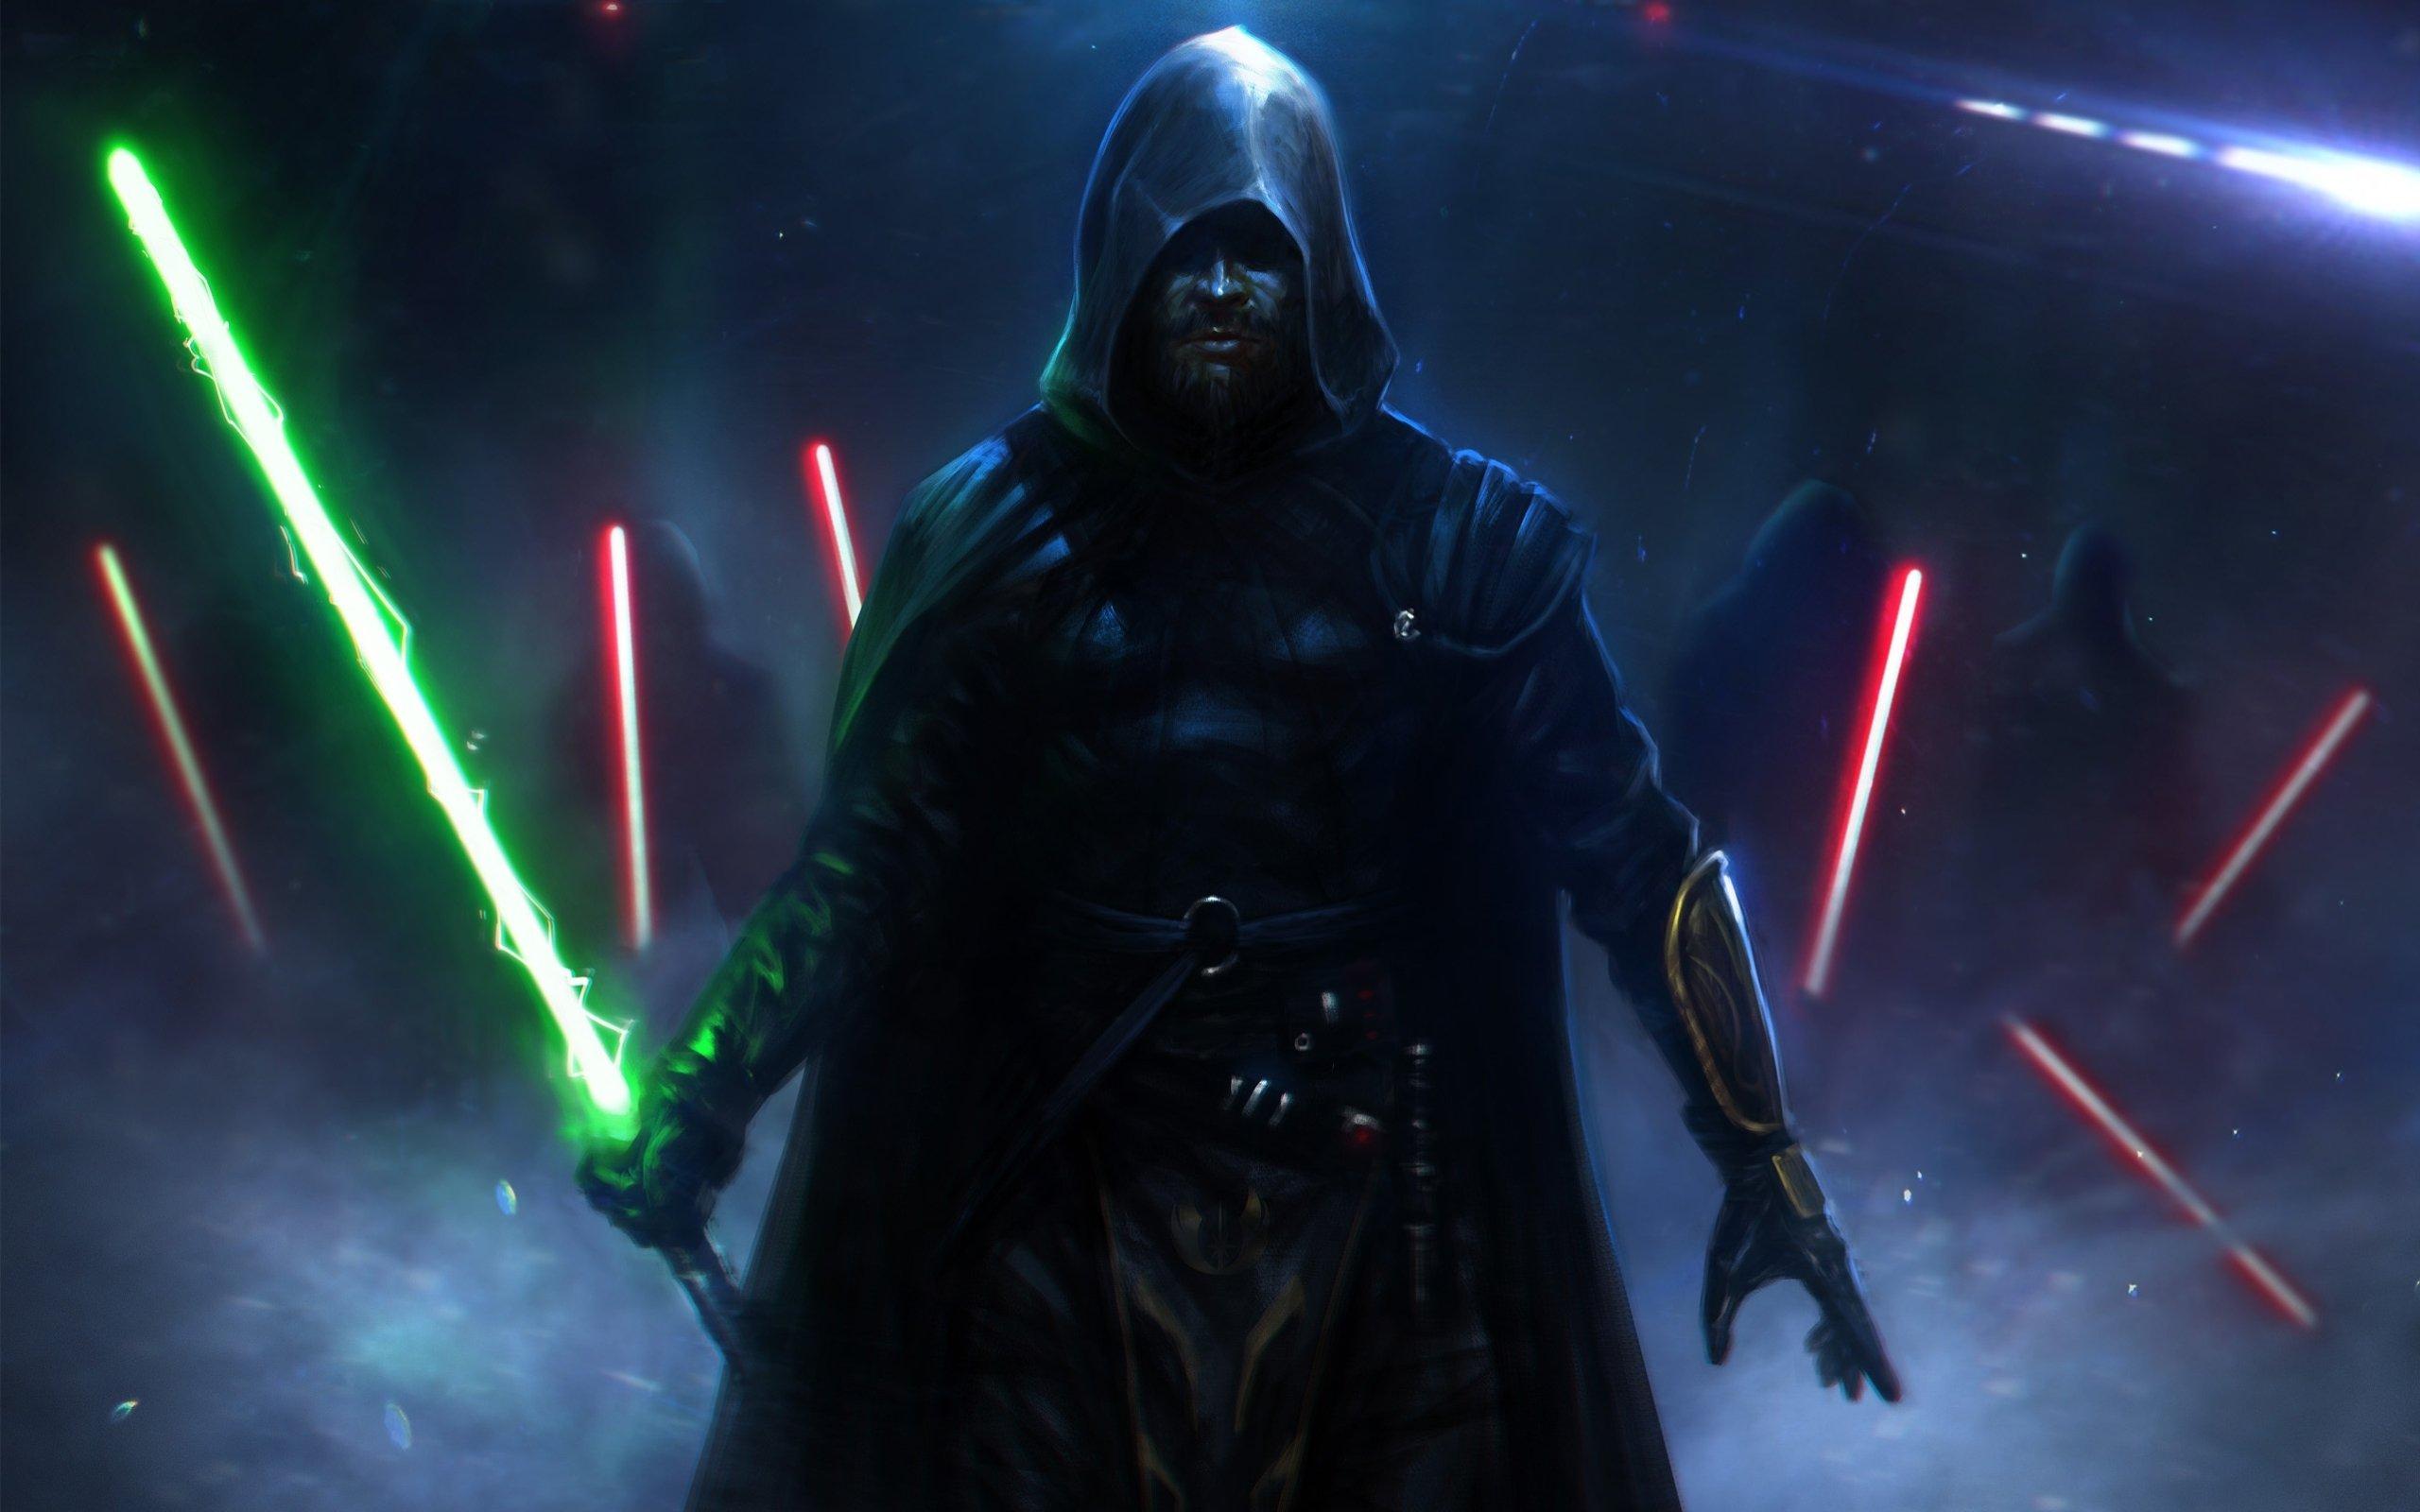 Star Wars The Force Awakens Wallpaper 3 Wallpapersbq